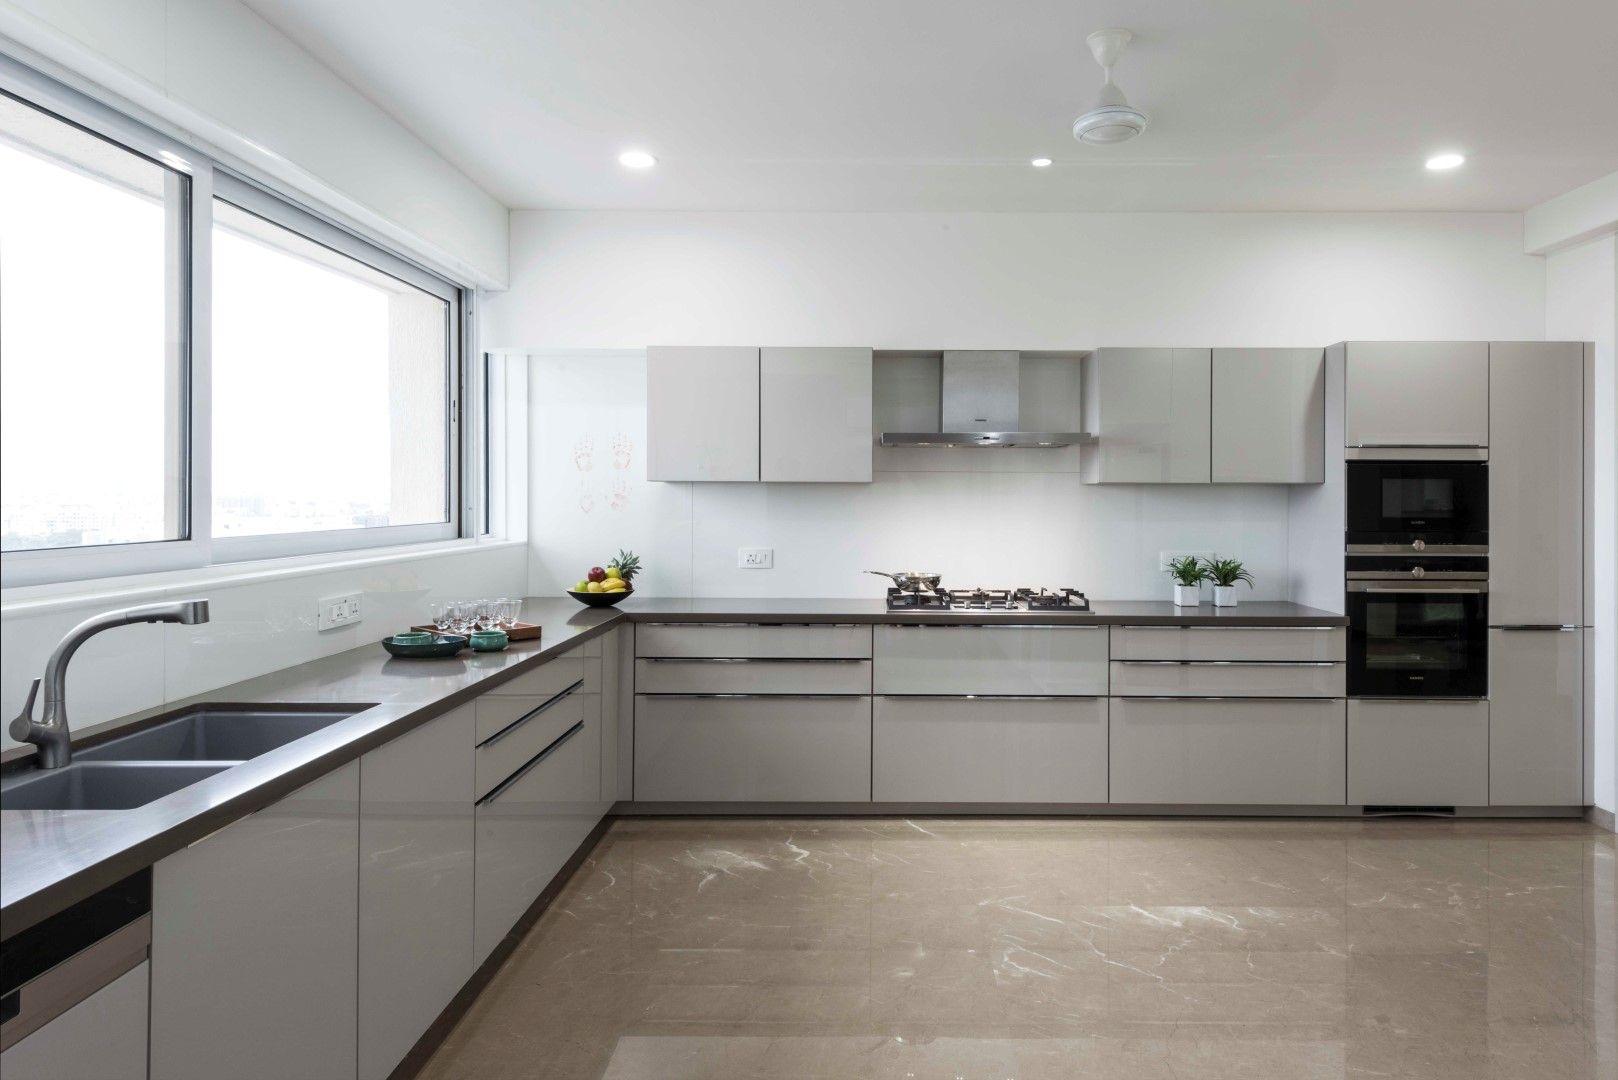 Modern Apartment Decor Usine Studio The Architects Diary Kitchen Interior Modern Kitchen Cabinet Design Modern Apartment Decor